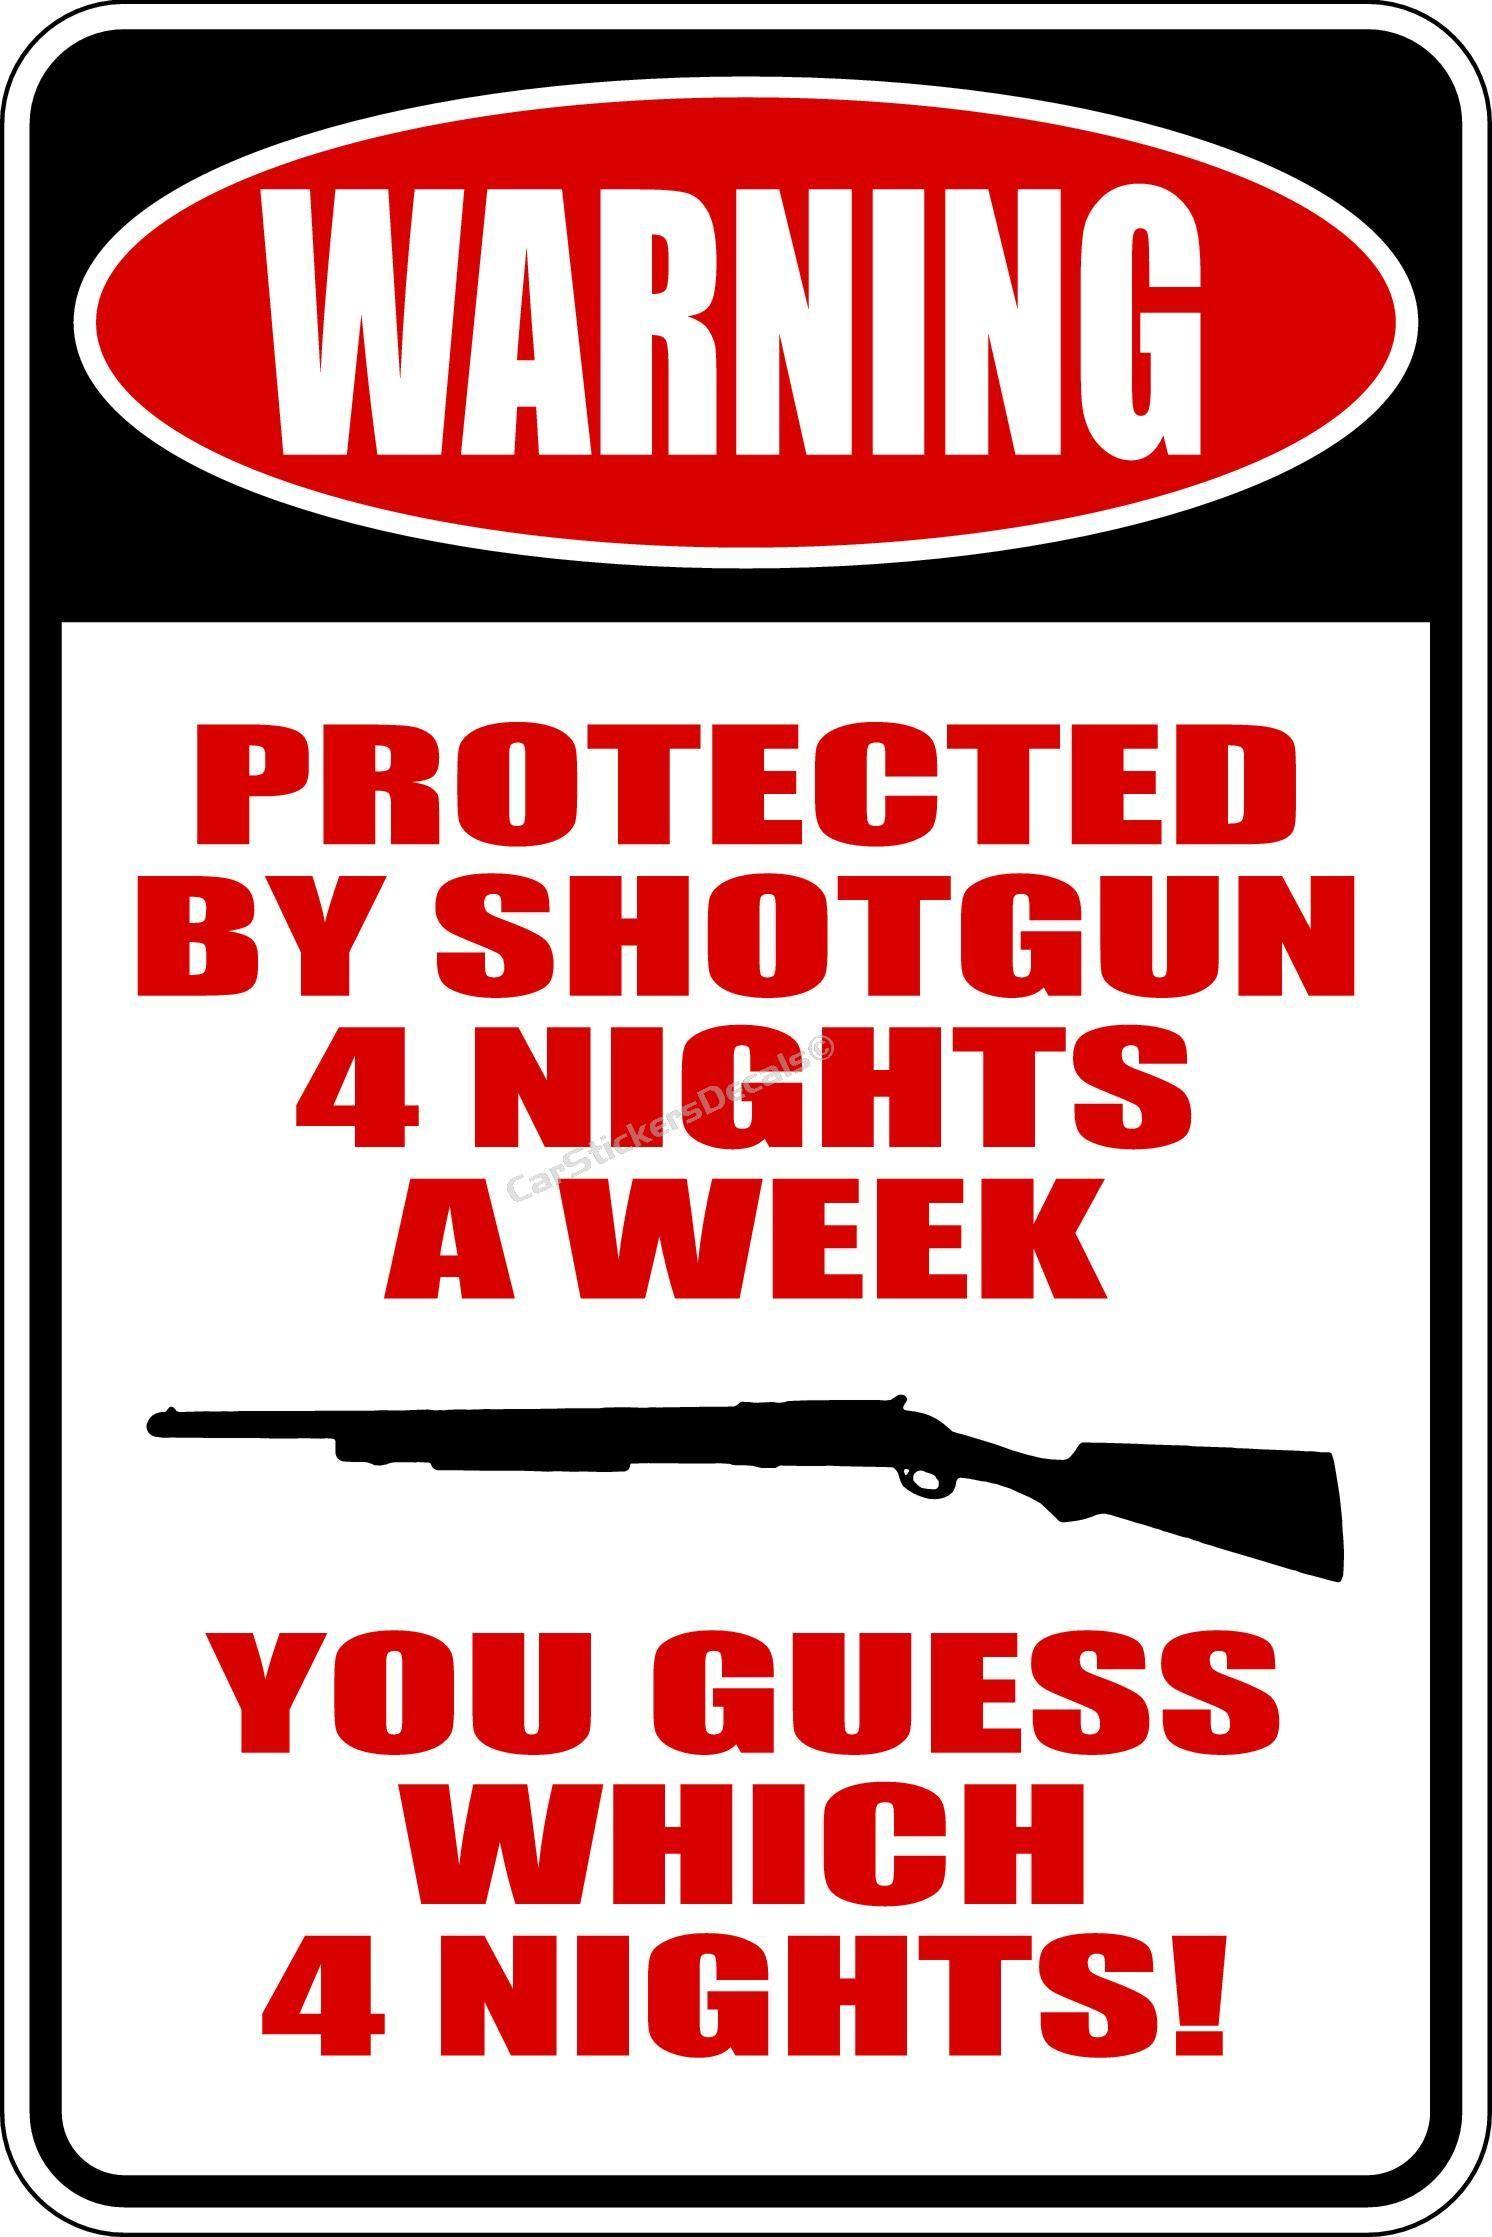 No Trespassers Beware Decal Shotgun Warning Home Business Protection Sticker